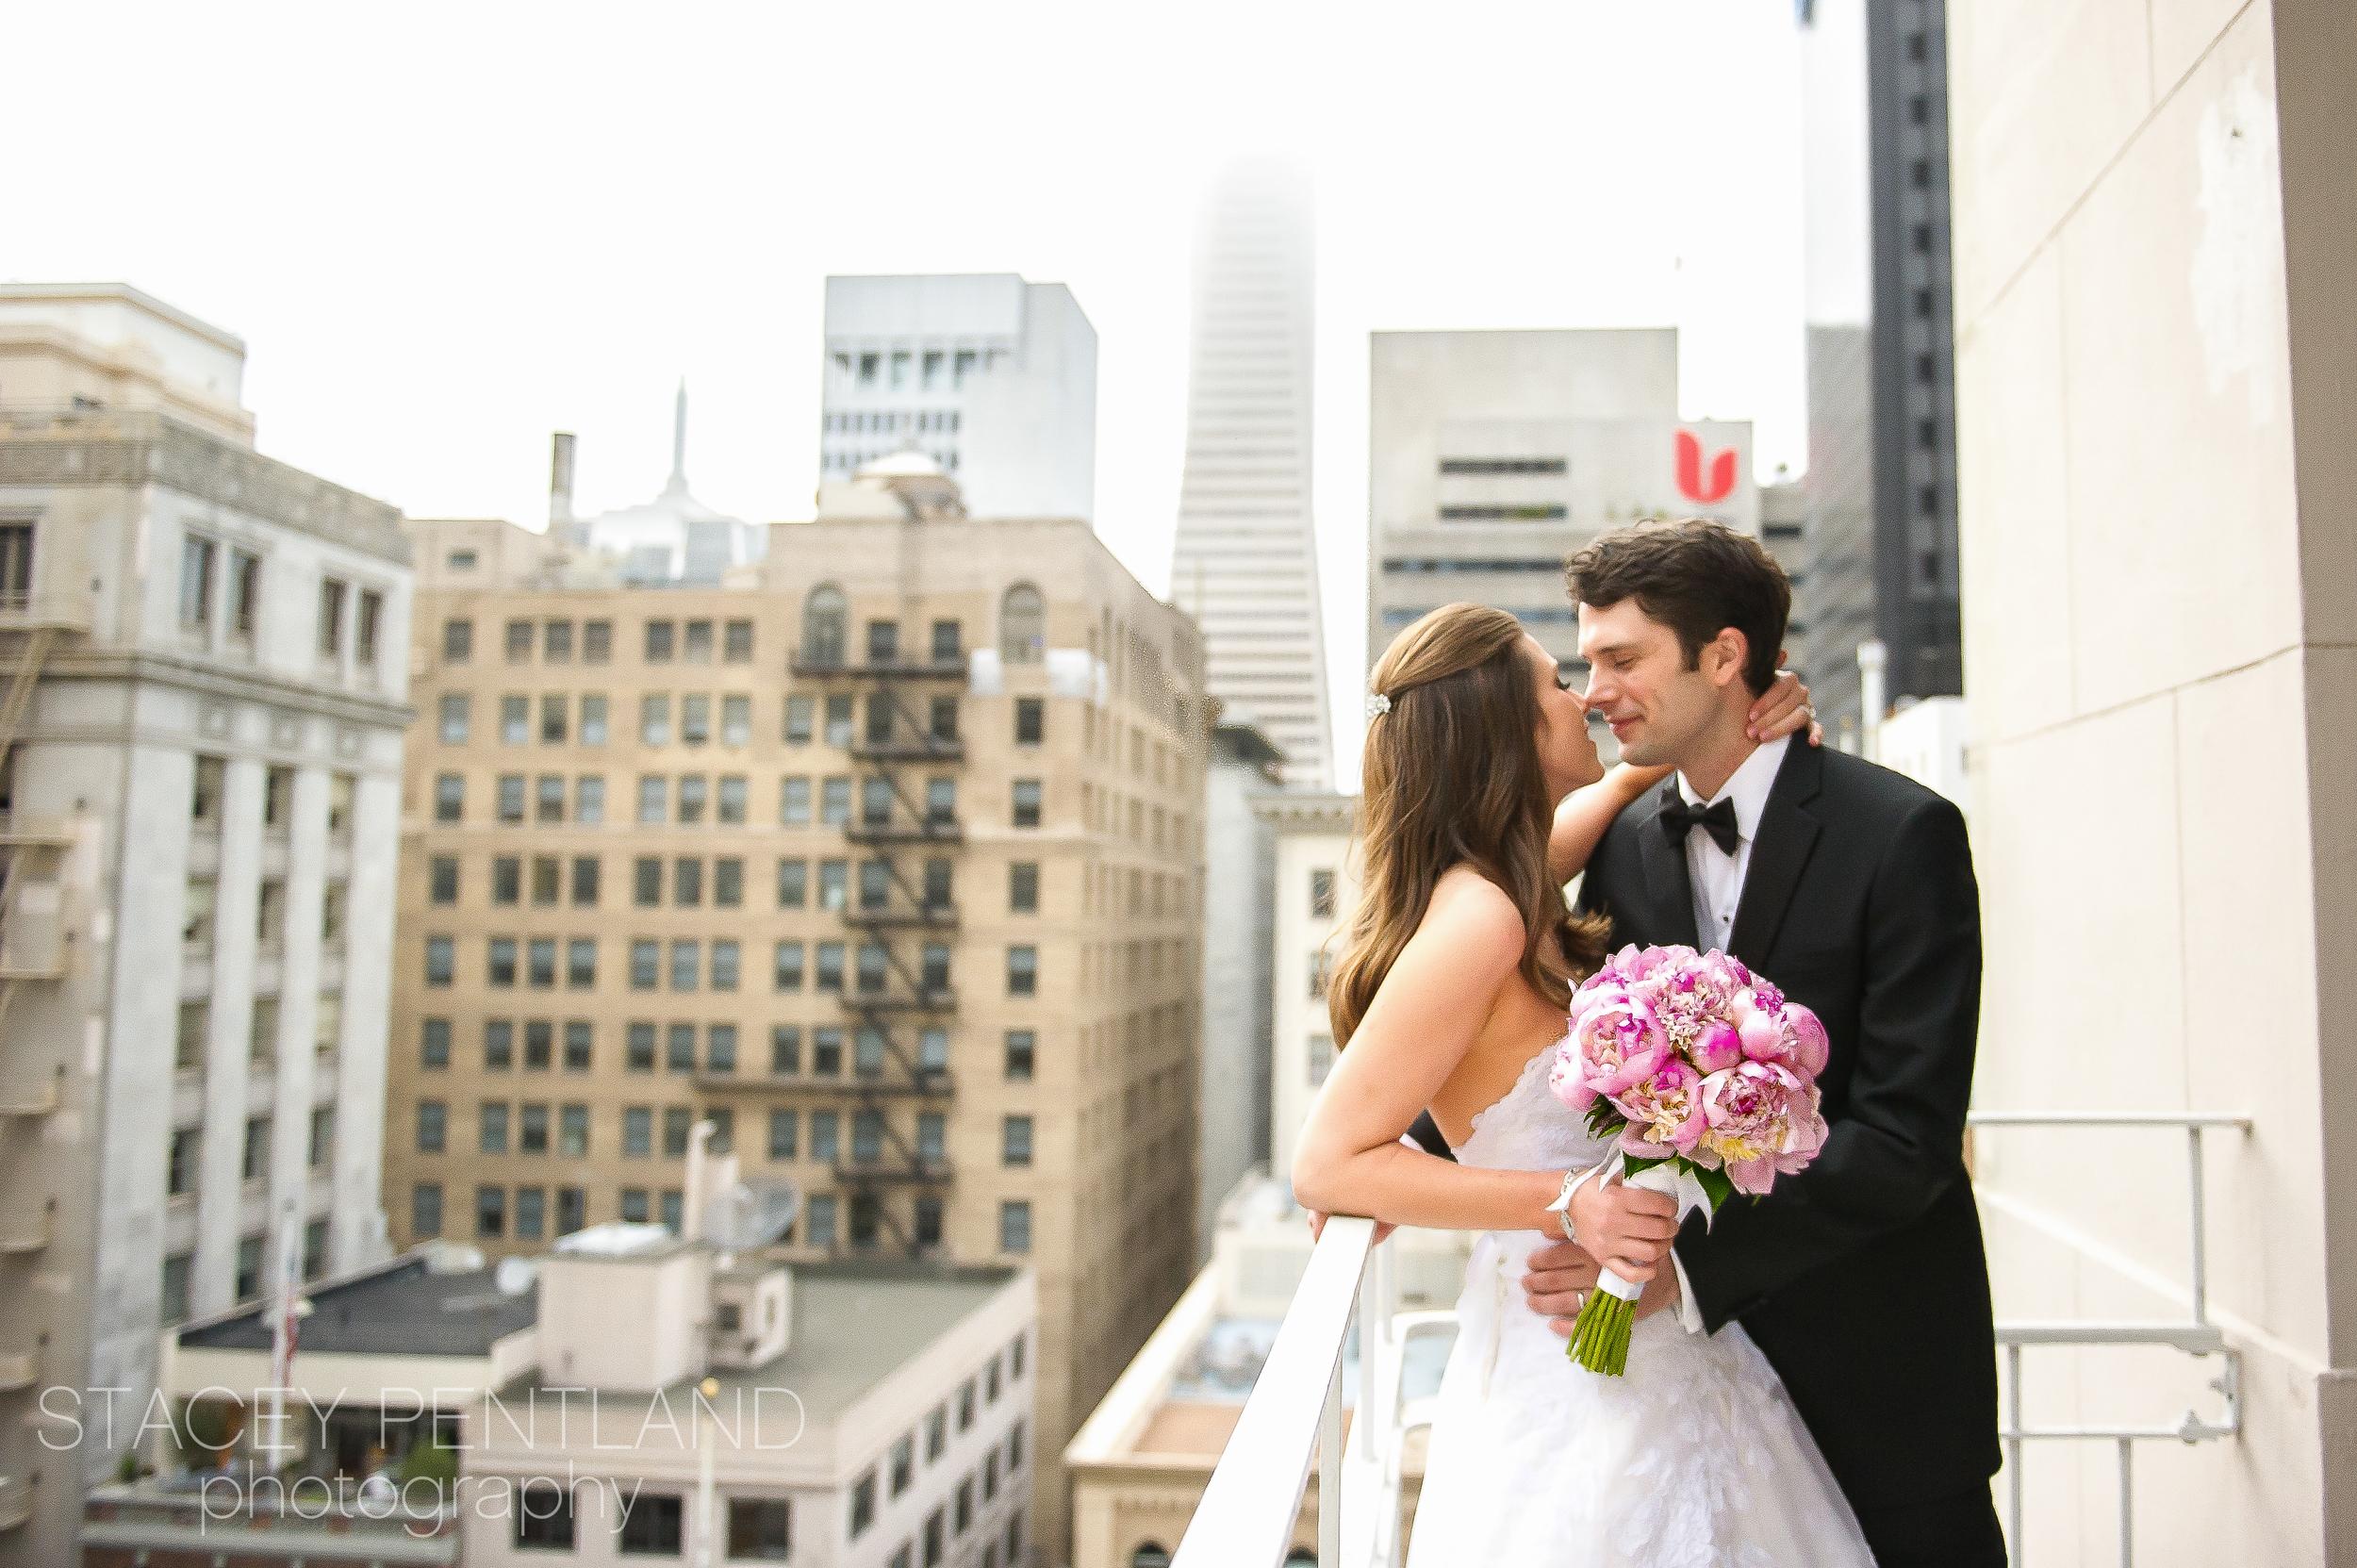 lindsay+wyatt_wedding_spp_001.jpg